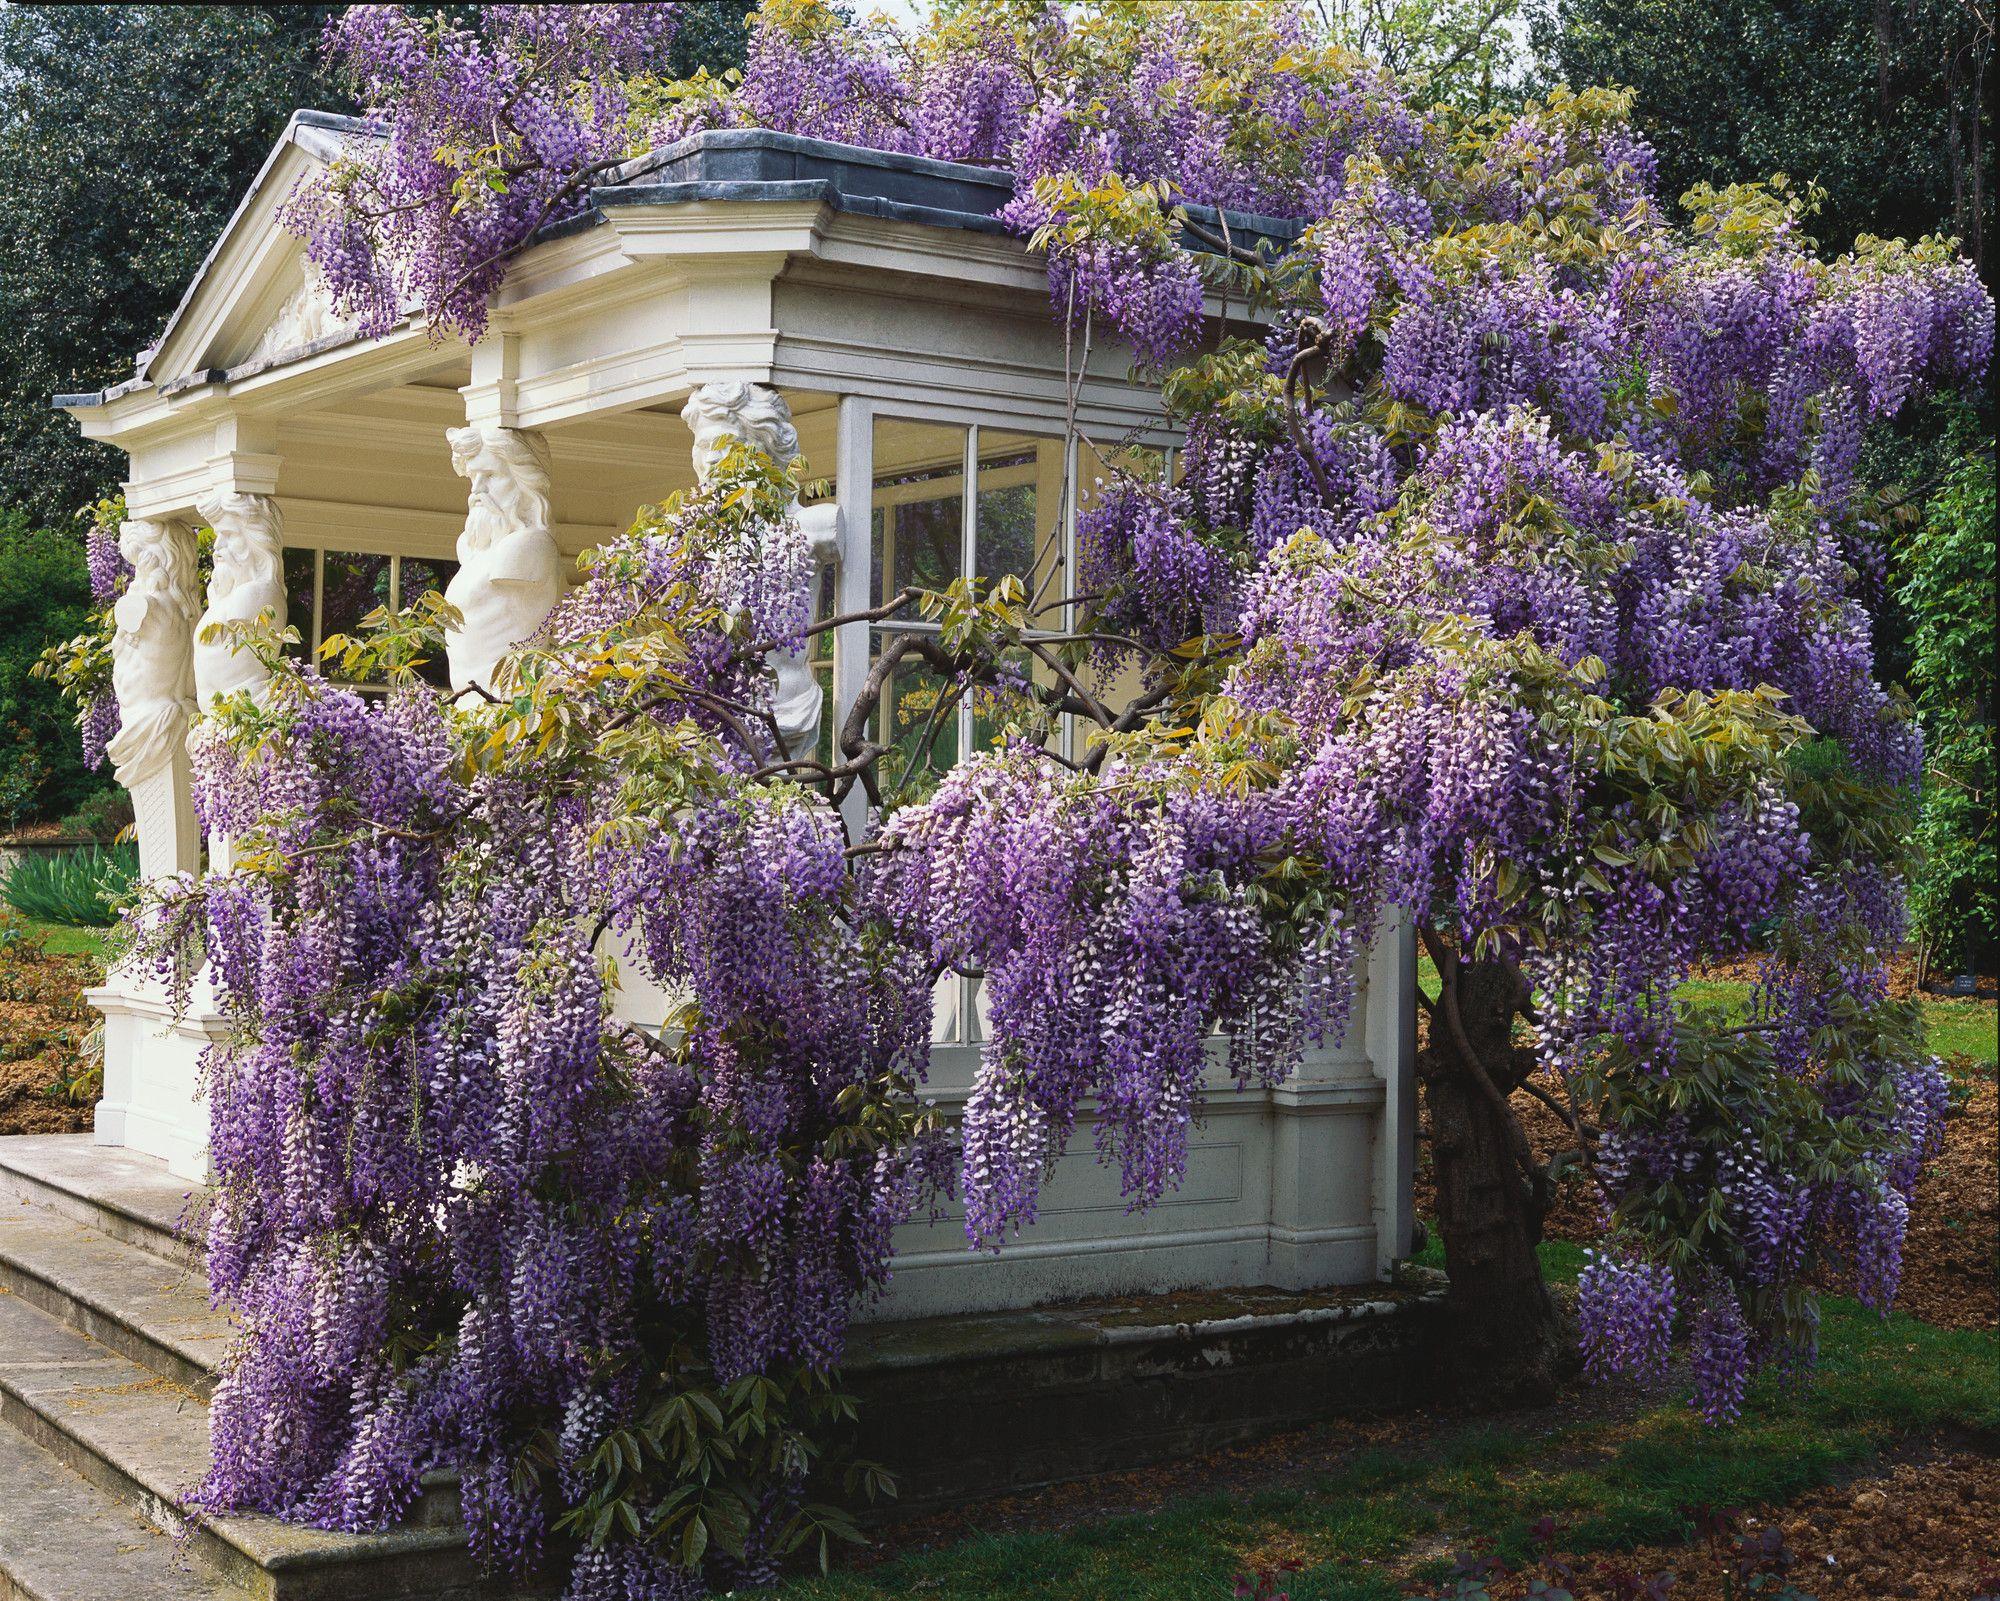 Buckingham Palace Gardens Beautiful Gardens Dream Garden Wisteria